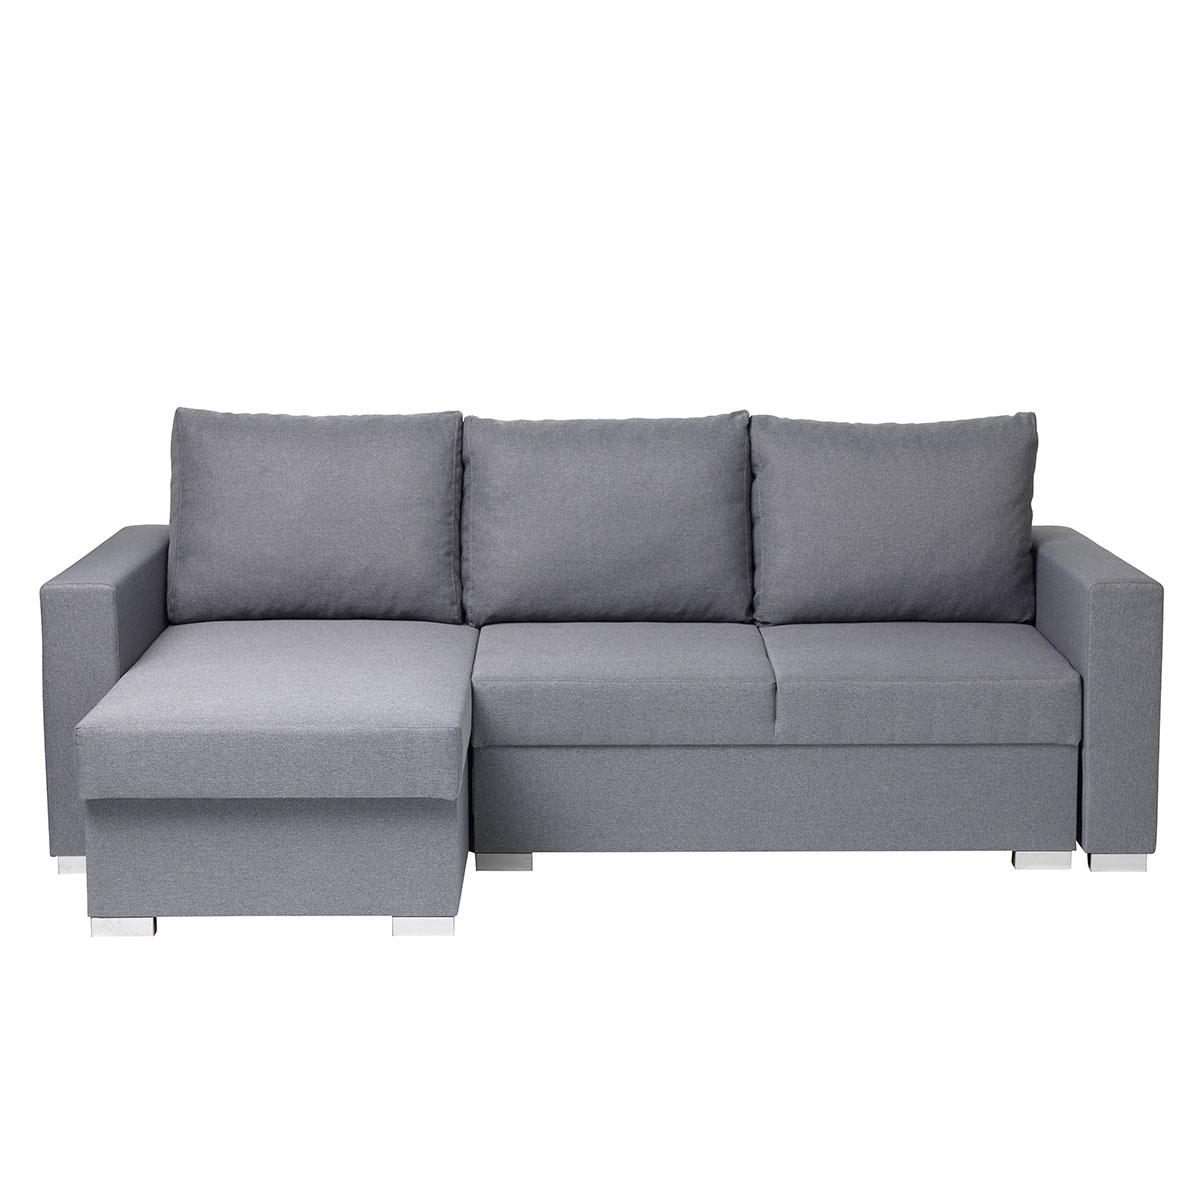 sofa med opbevaringsrum